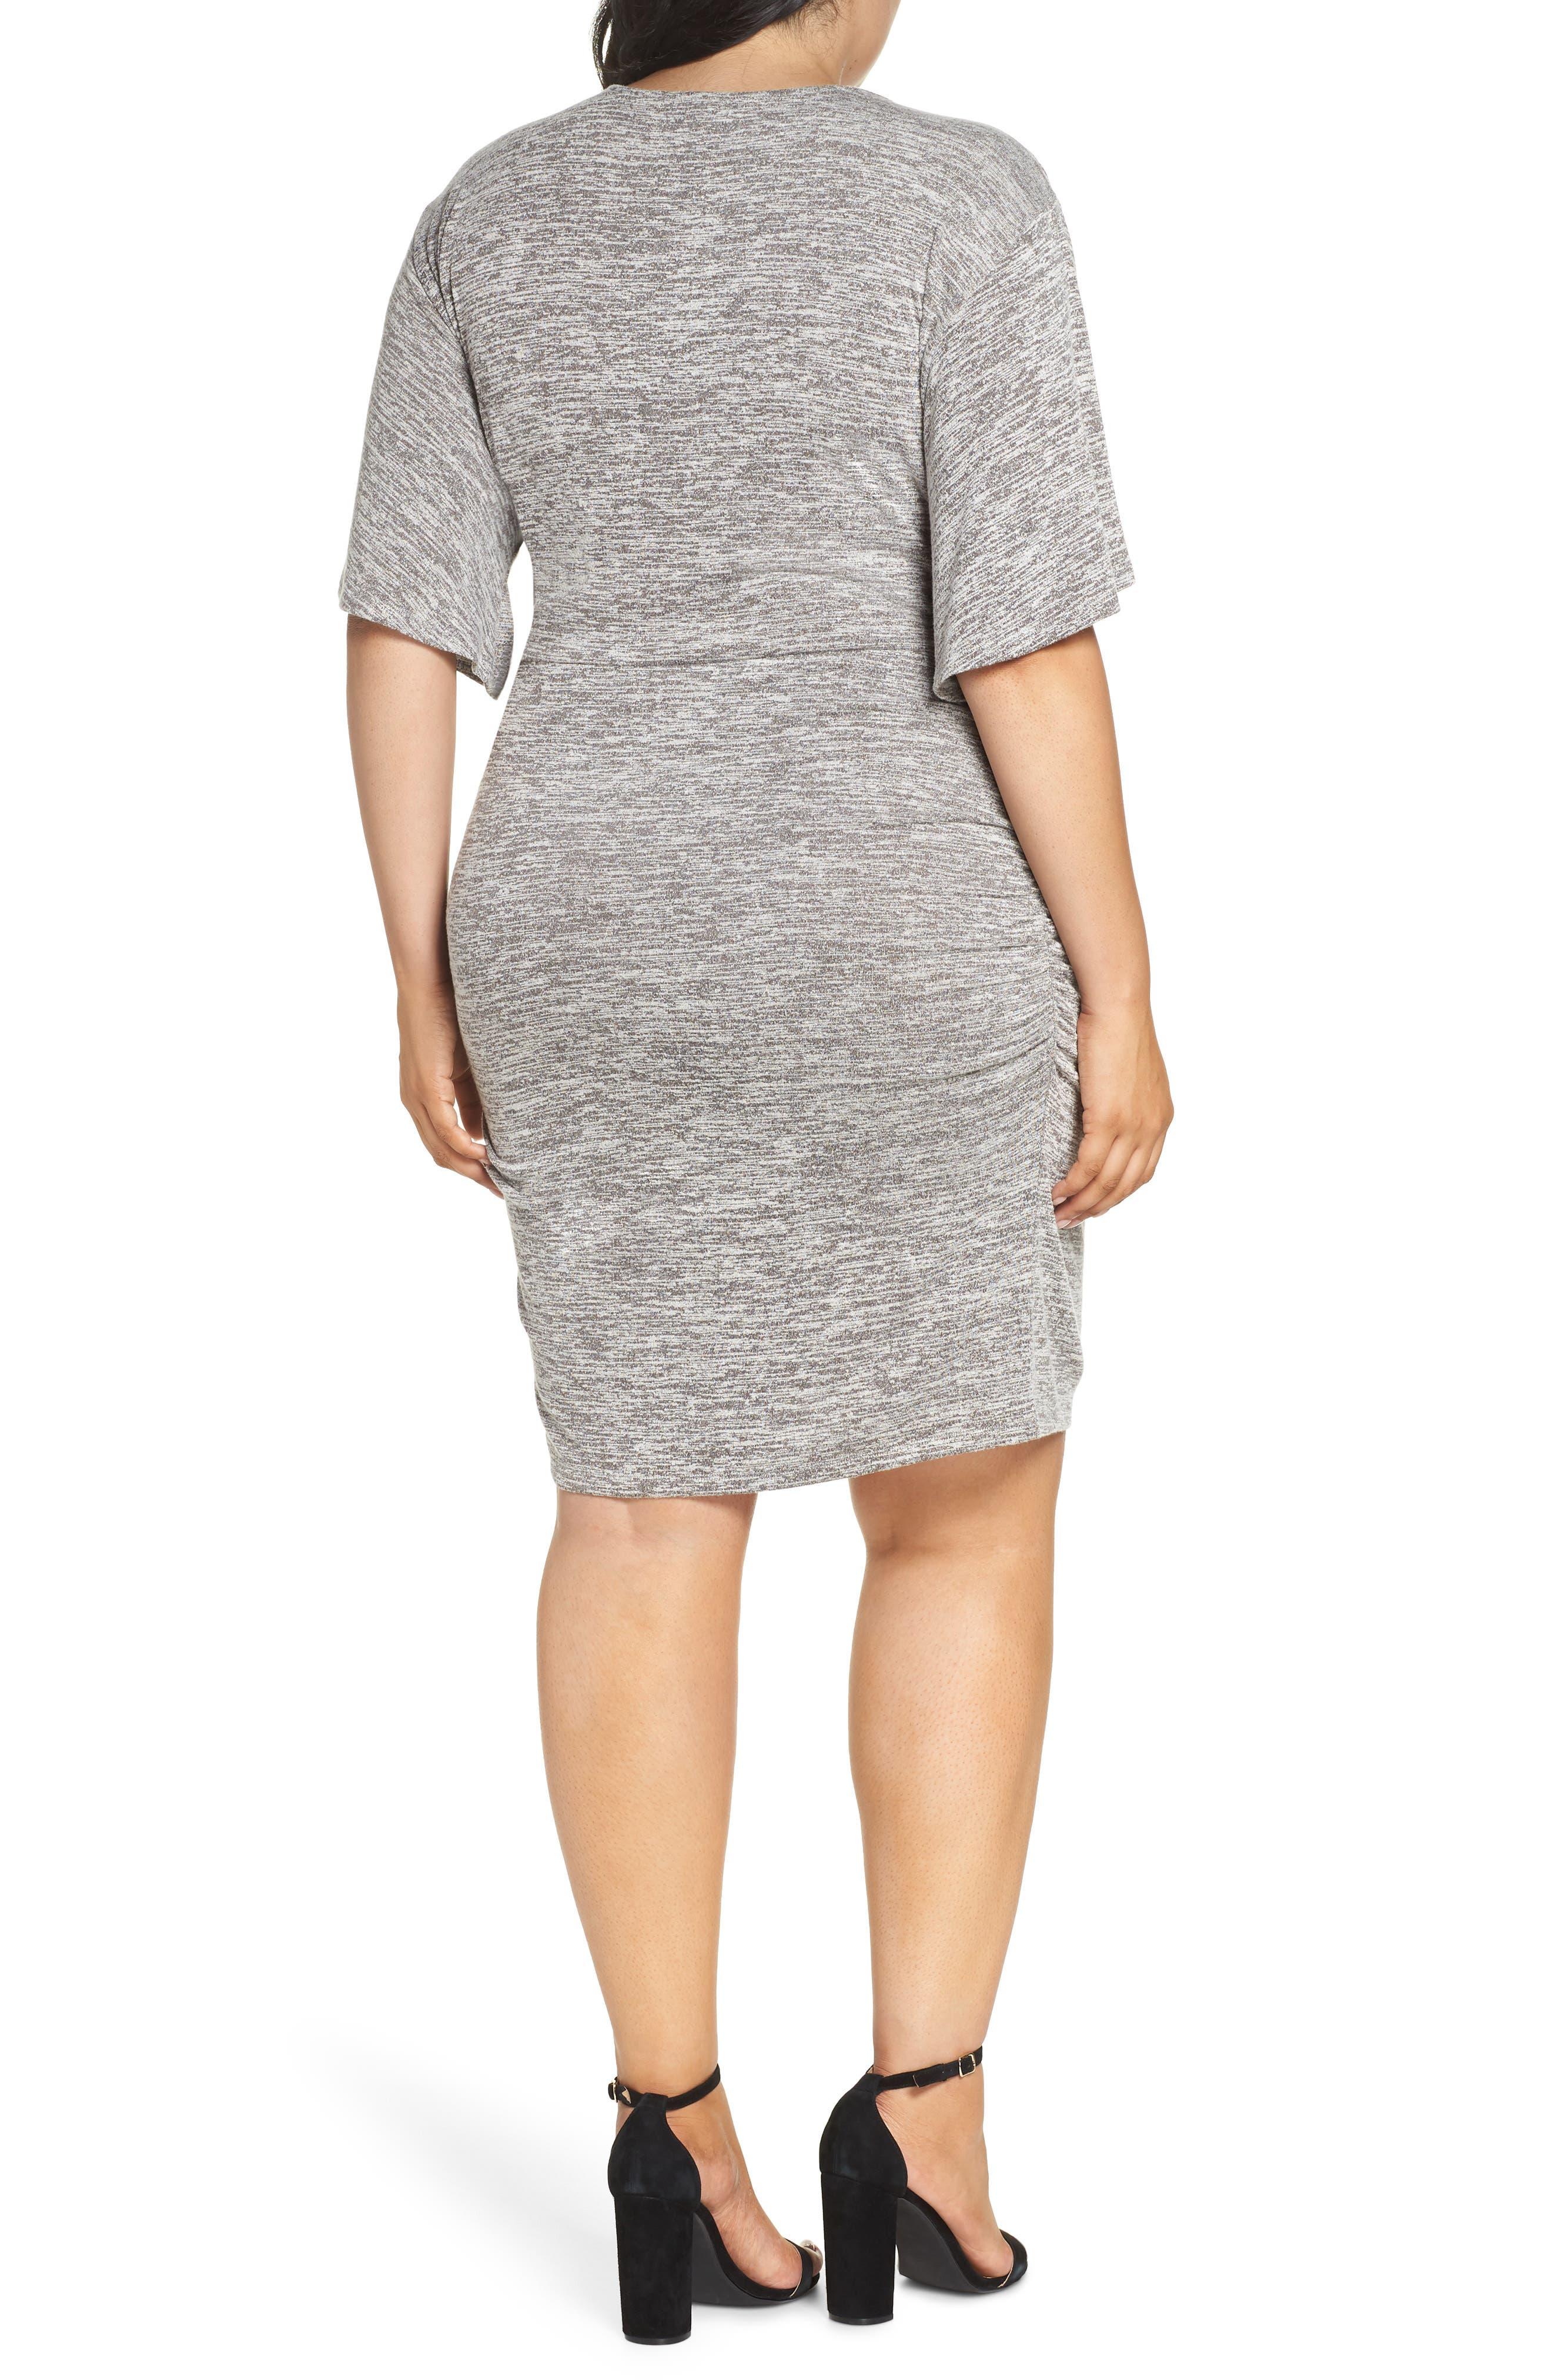 Wrap Dress,                             Alternate thumbnail 9, color,                             GREY CLOUDY HEATHER